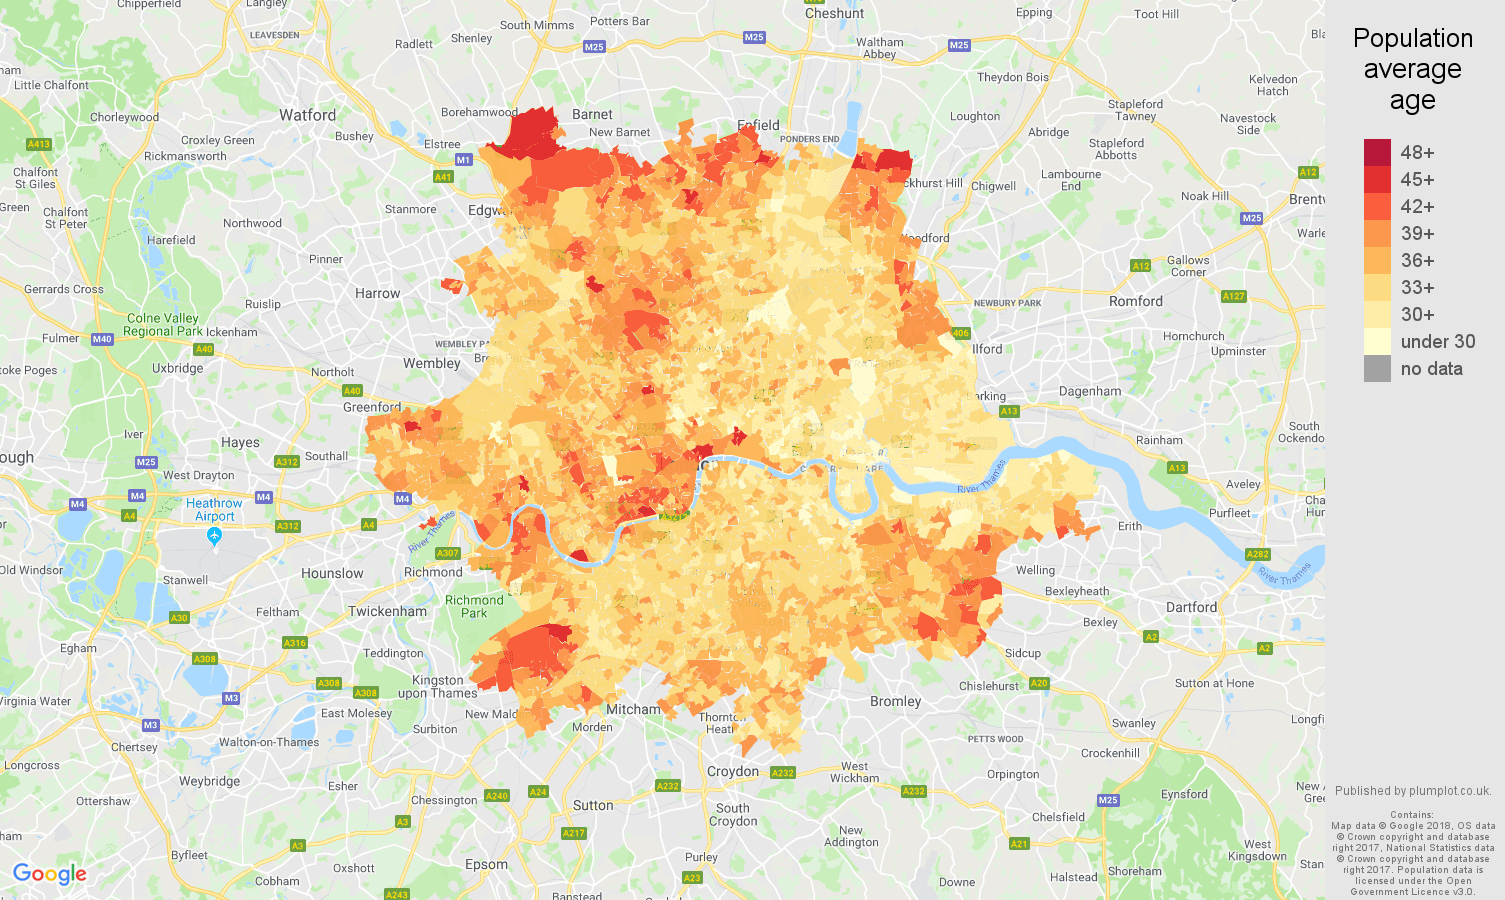 Inner London population average age map